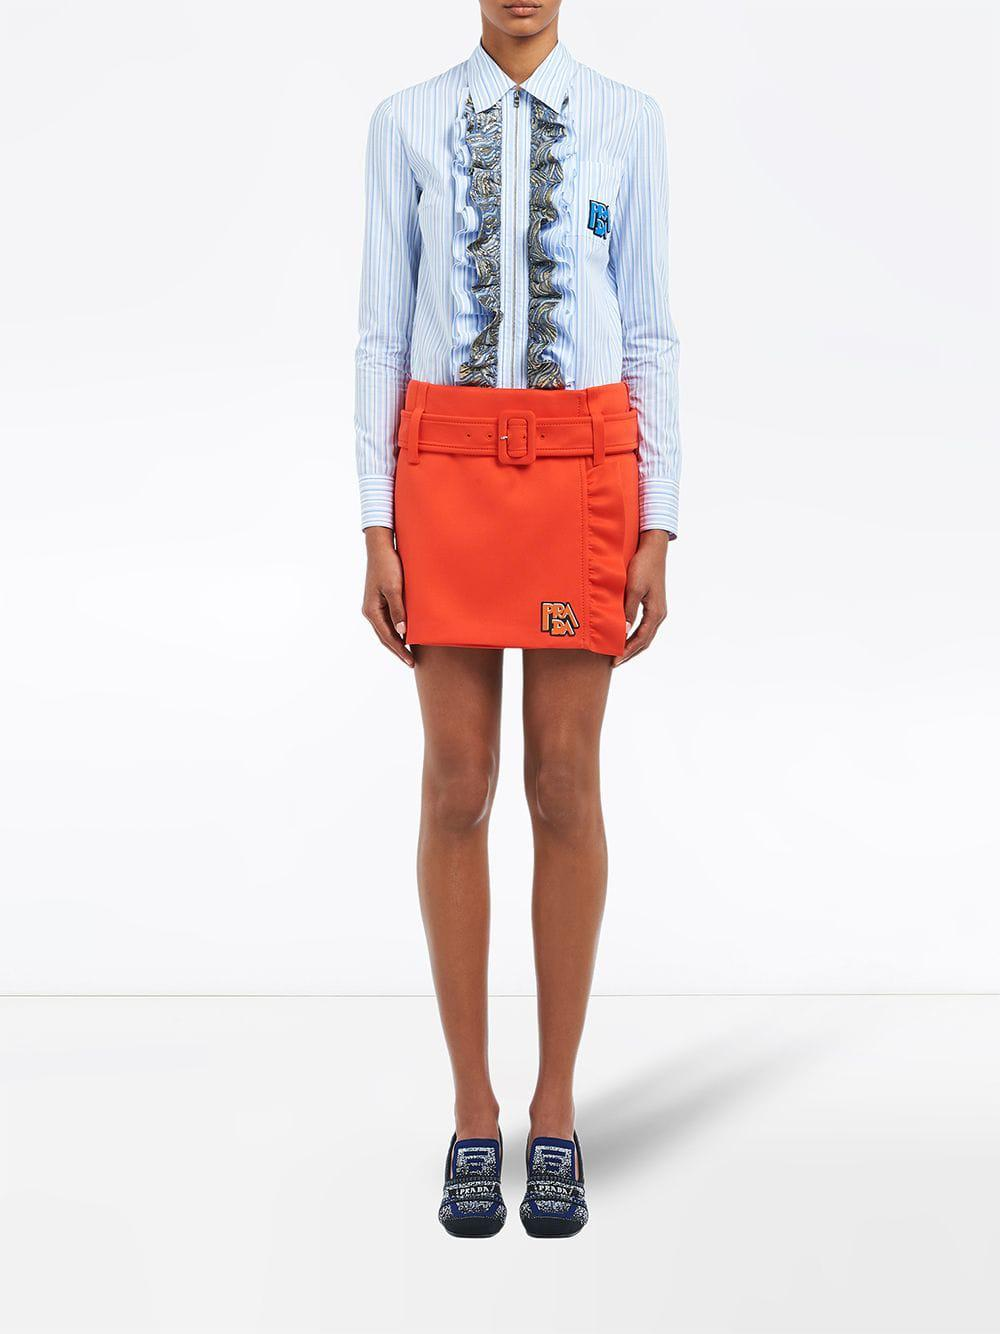 00cb2e19c2736 Lyst - Prada Ruffled Detail Mini Skirt in Orange